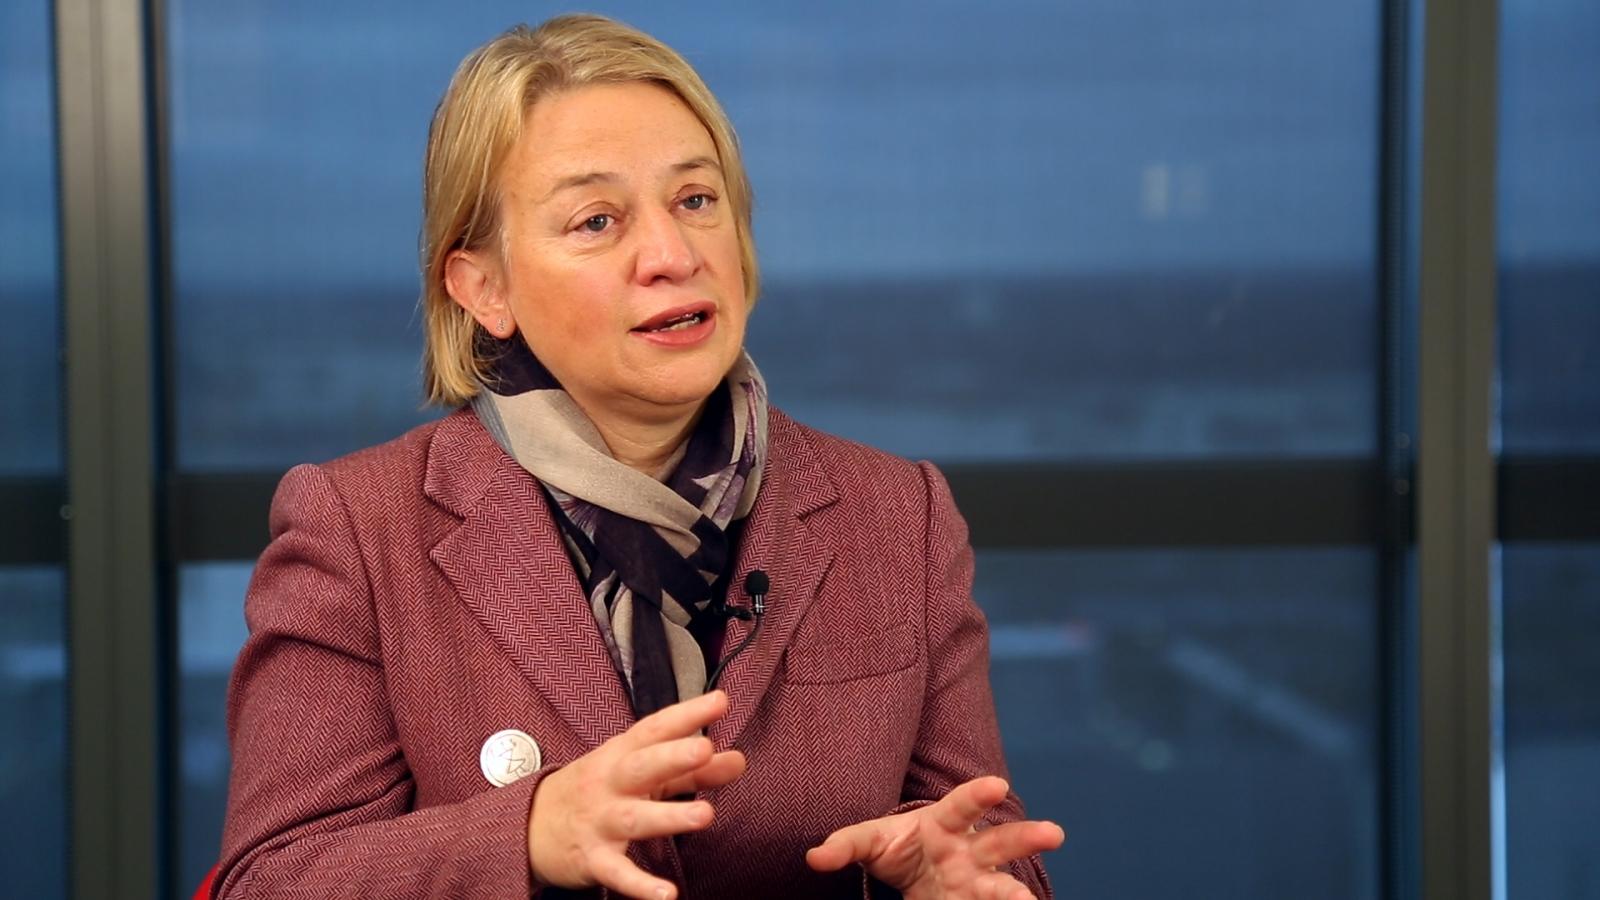 Natalie Bennett: Green Party can break British politics wide open in 2015